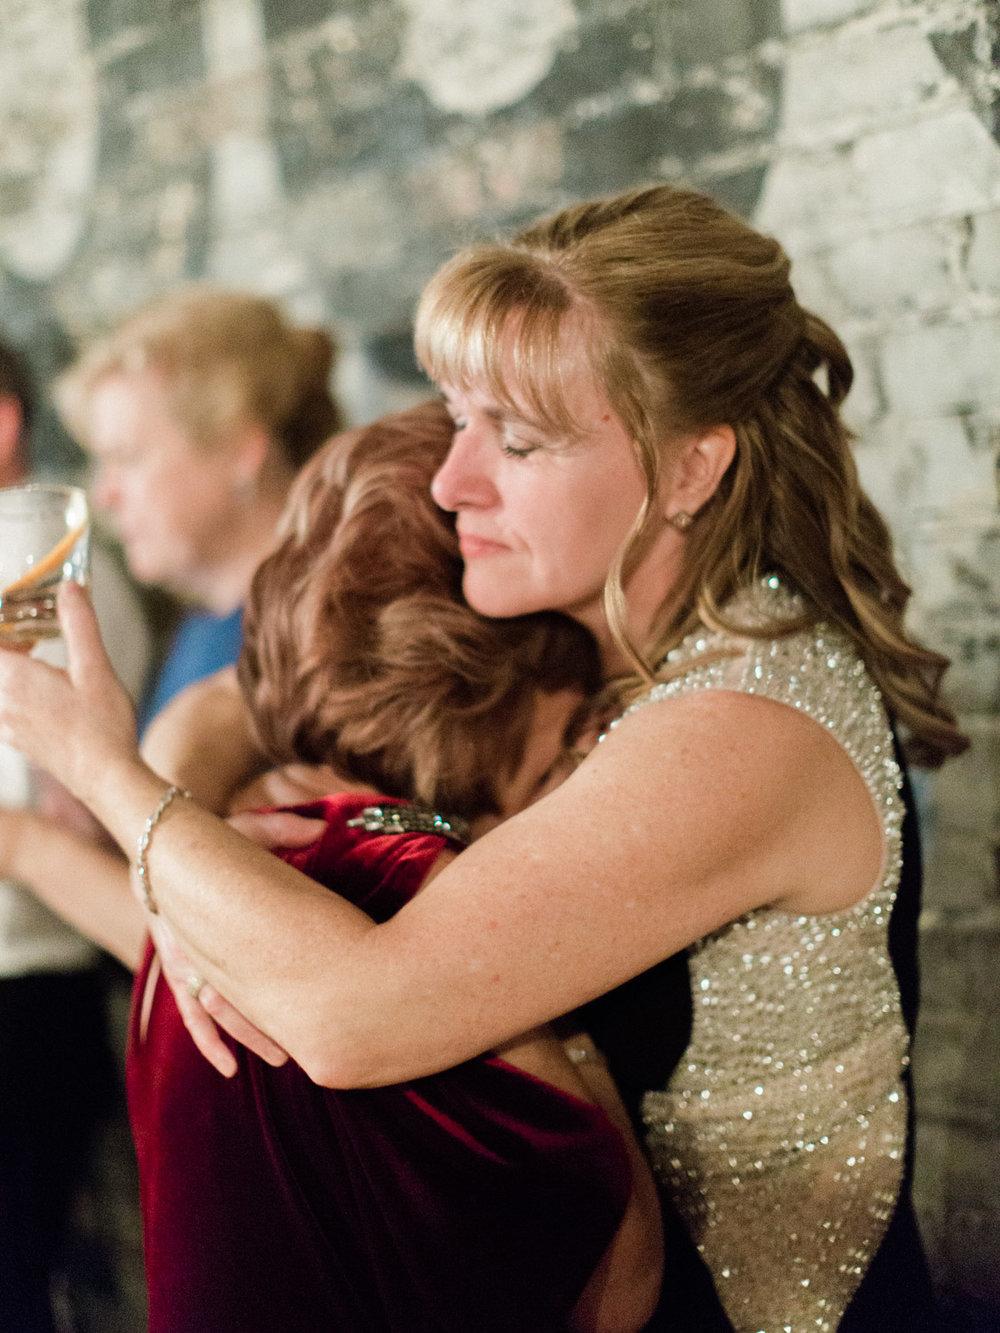 corynn-fowler-photography-toronto-collingwood-destination-wedding-photographer-937.jpg